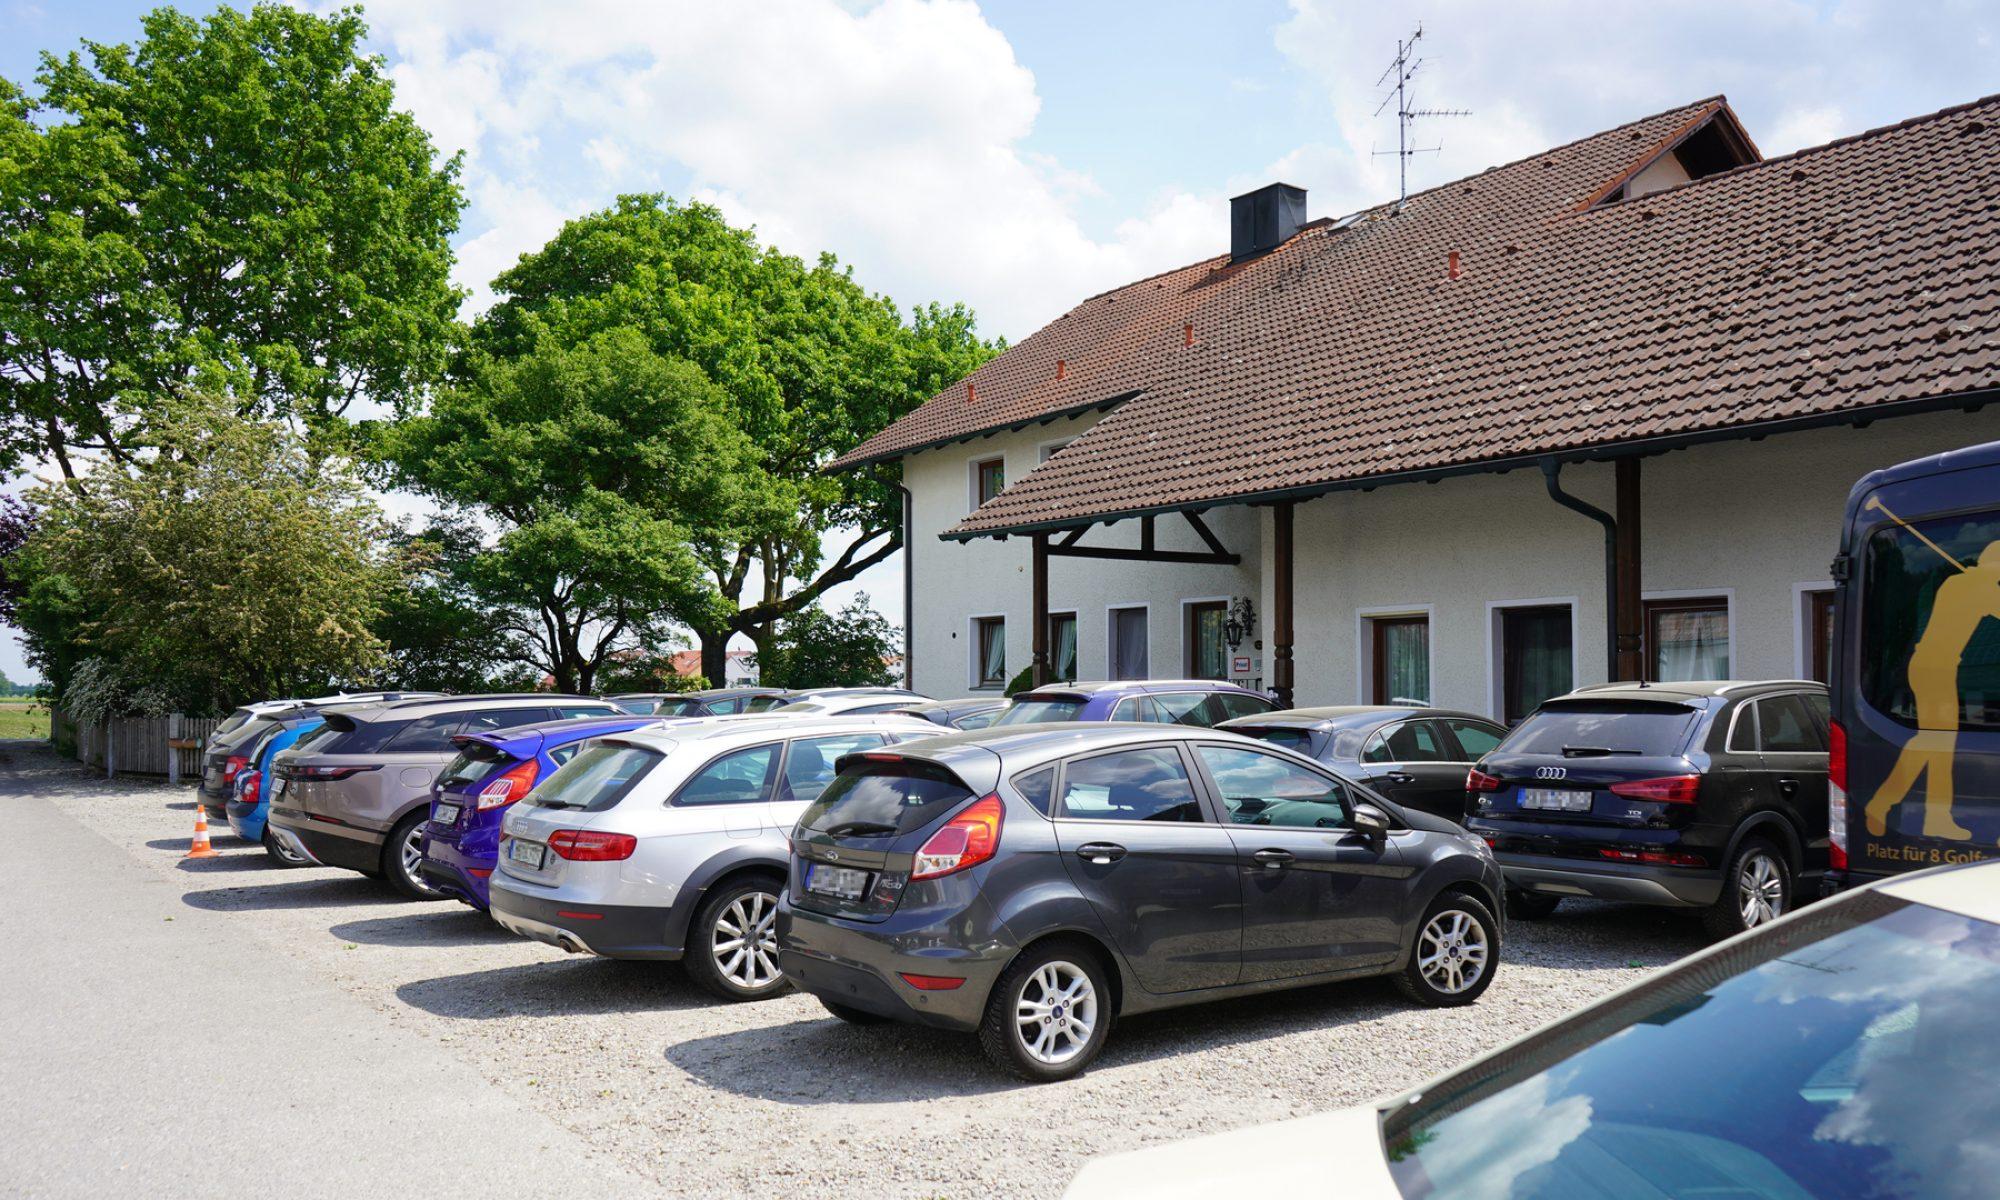 Parkservice Maier